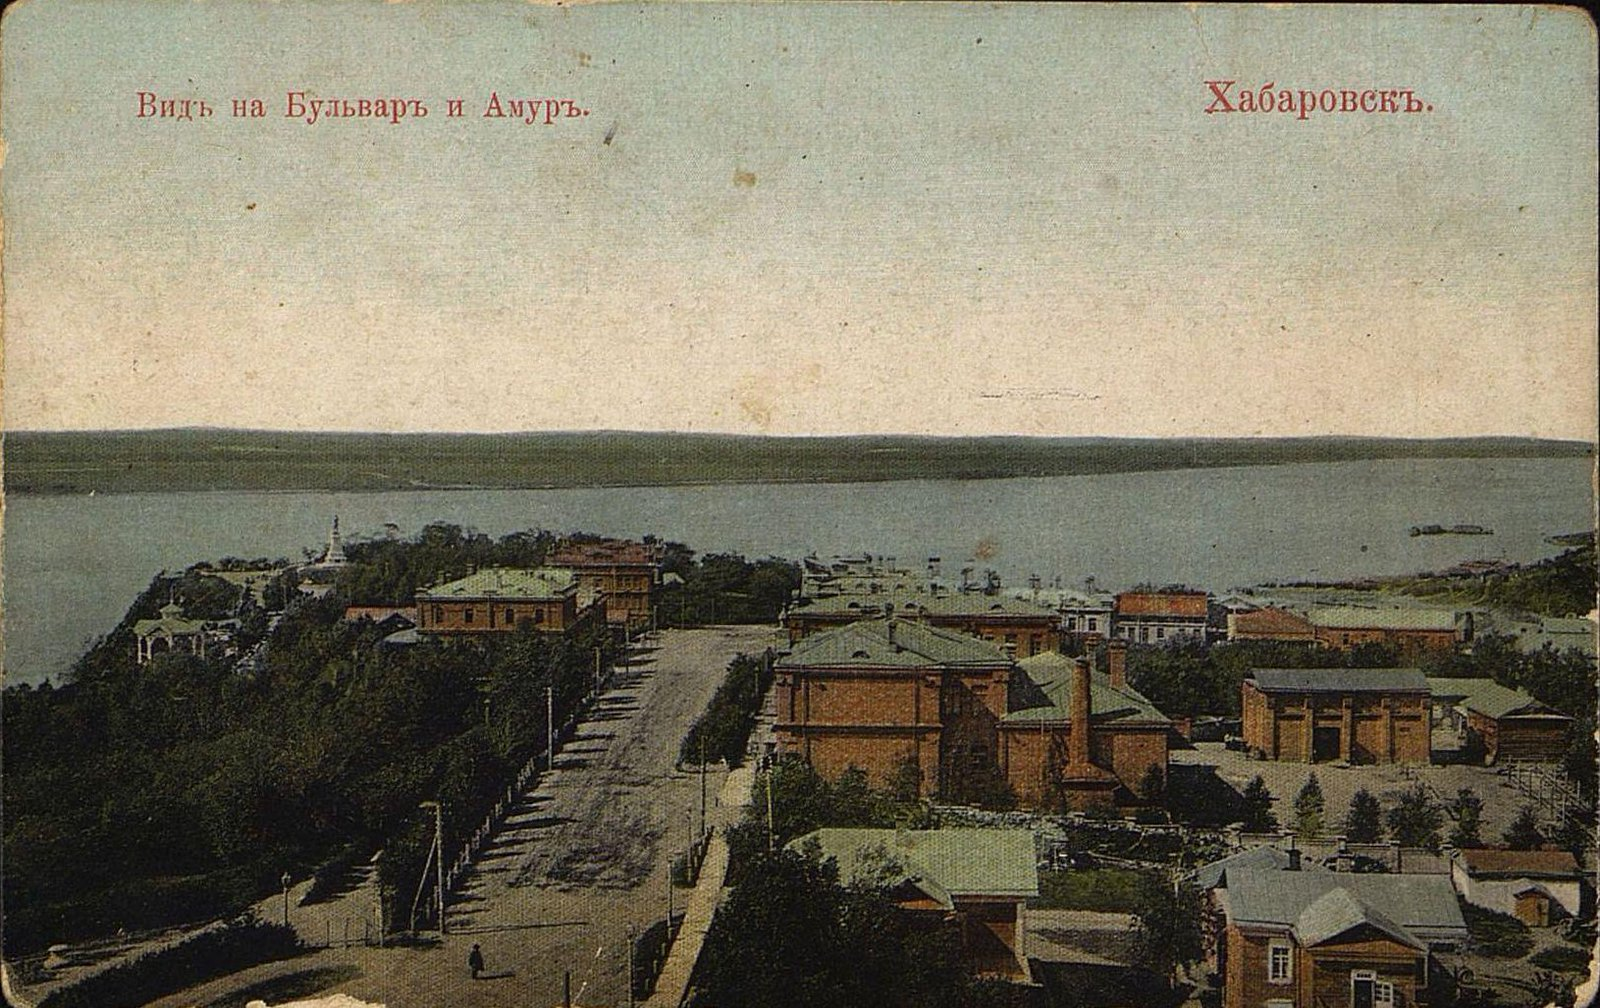 02. Вид на бульвар и Амур